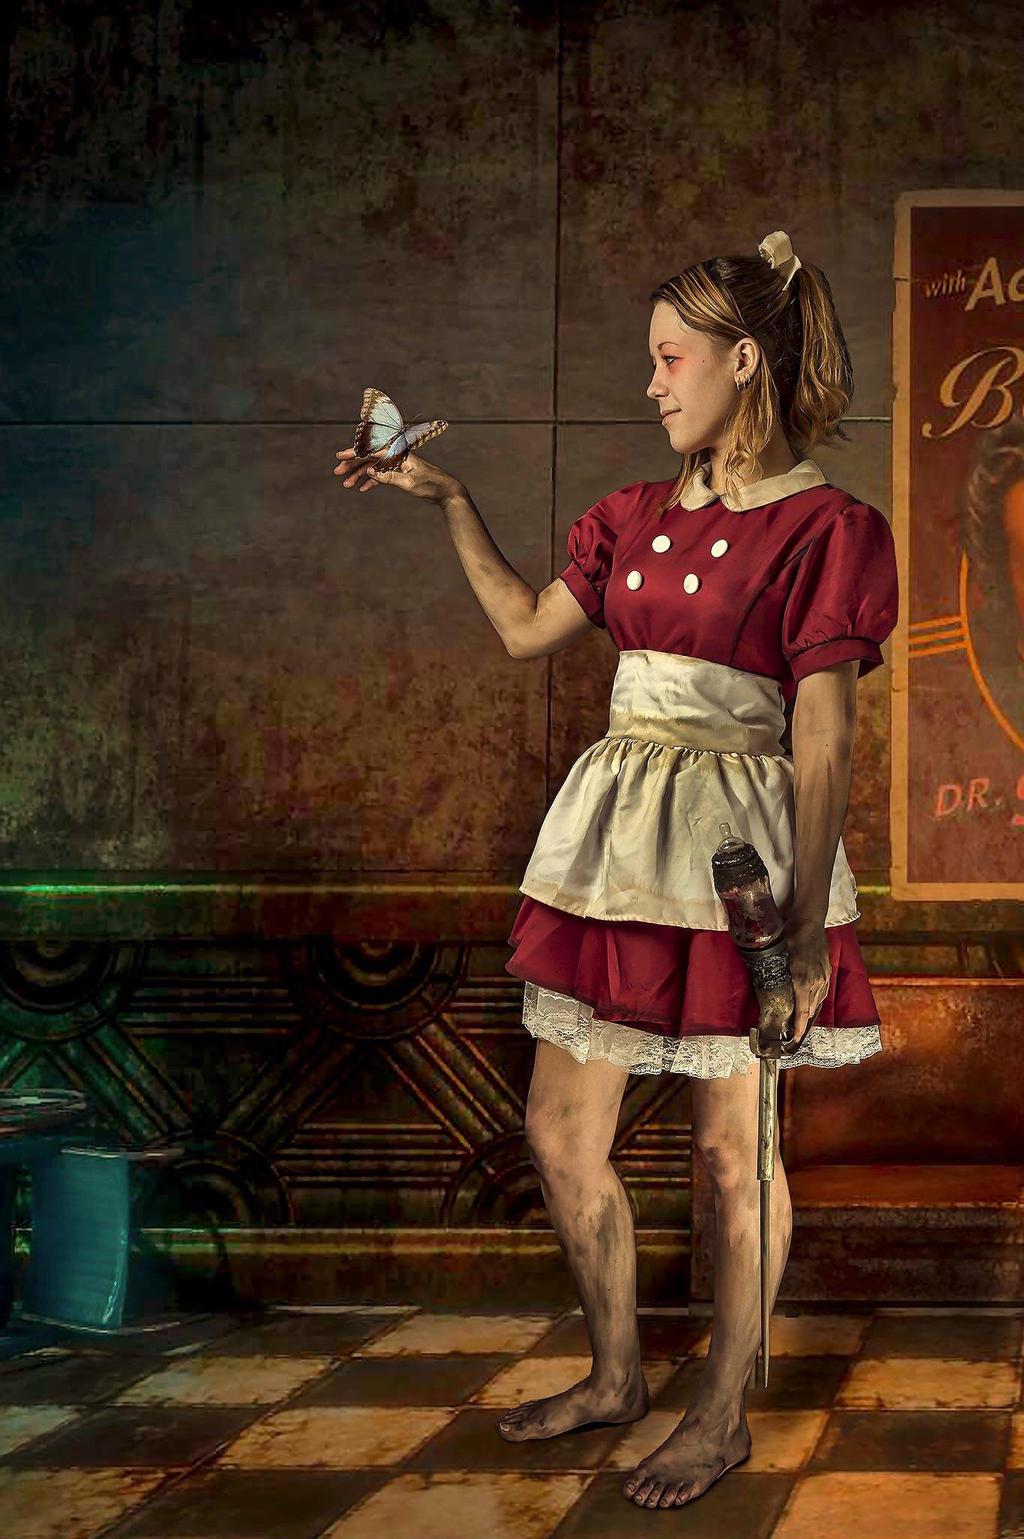 Little Sister - Bioshock by Iona-Cosplay on DeviantArt  Bioshock